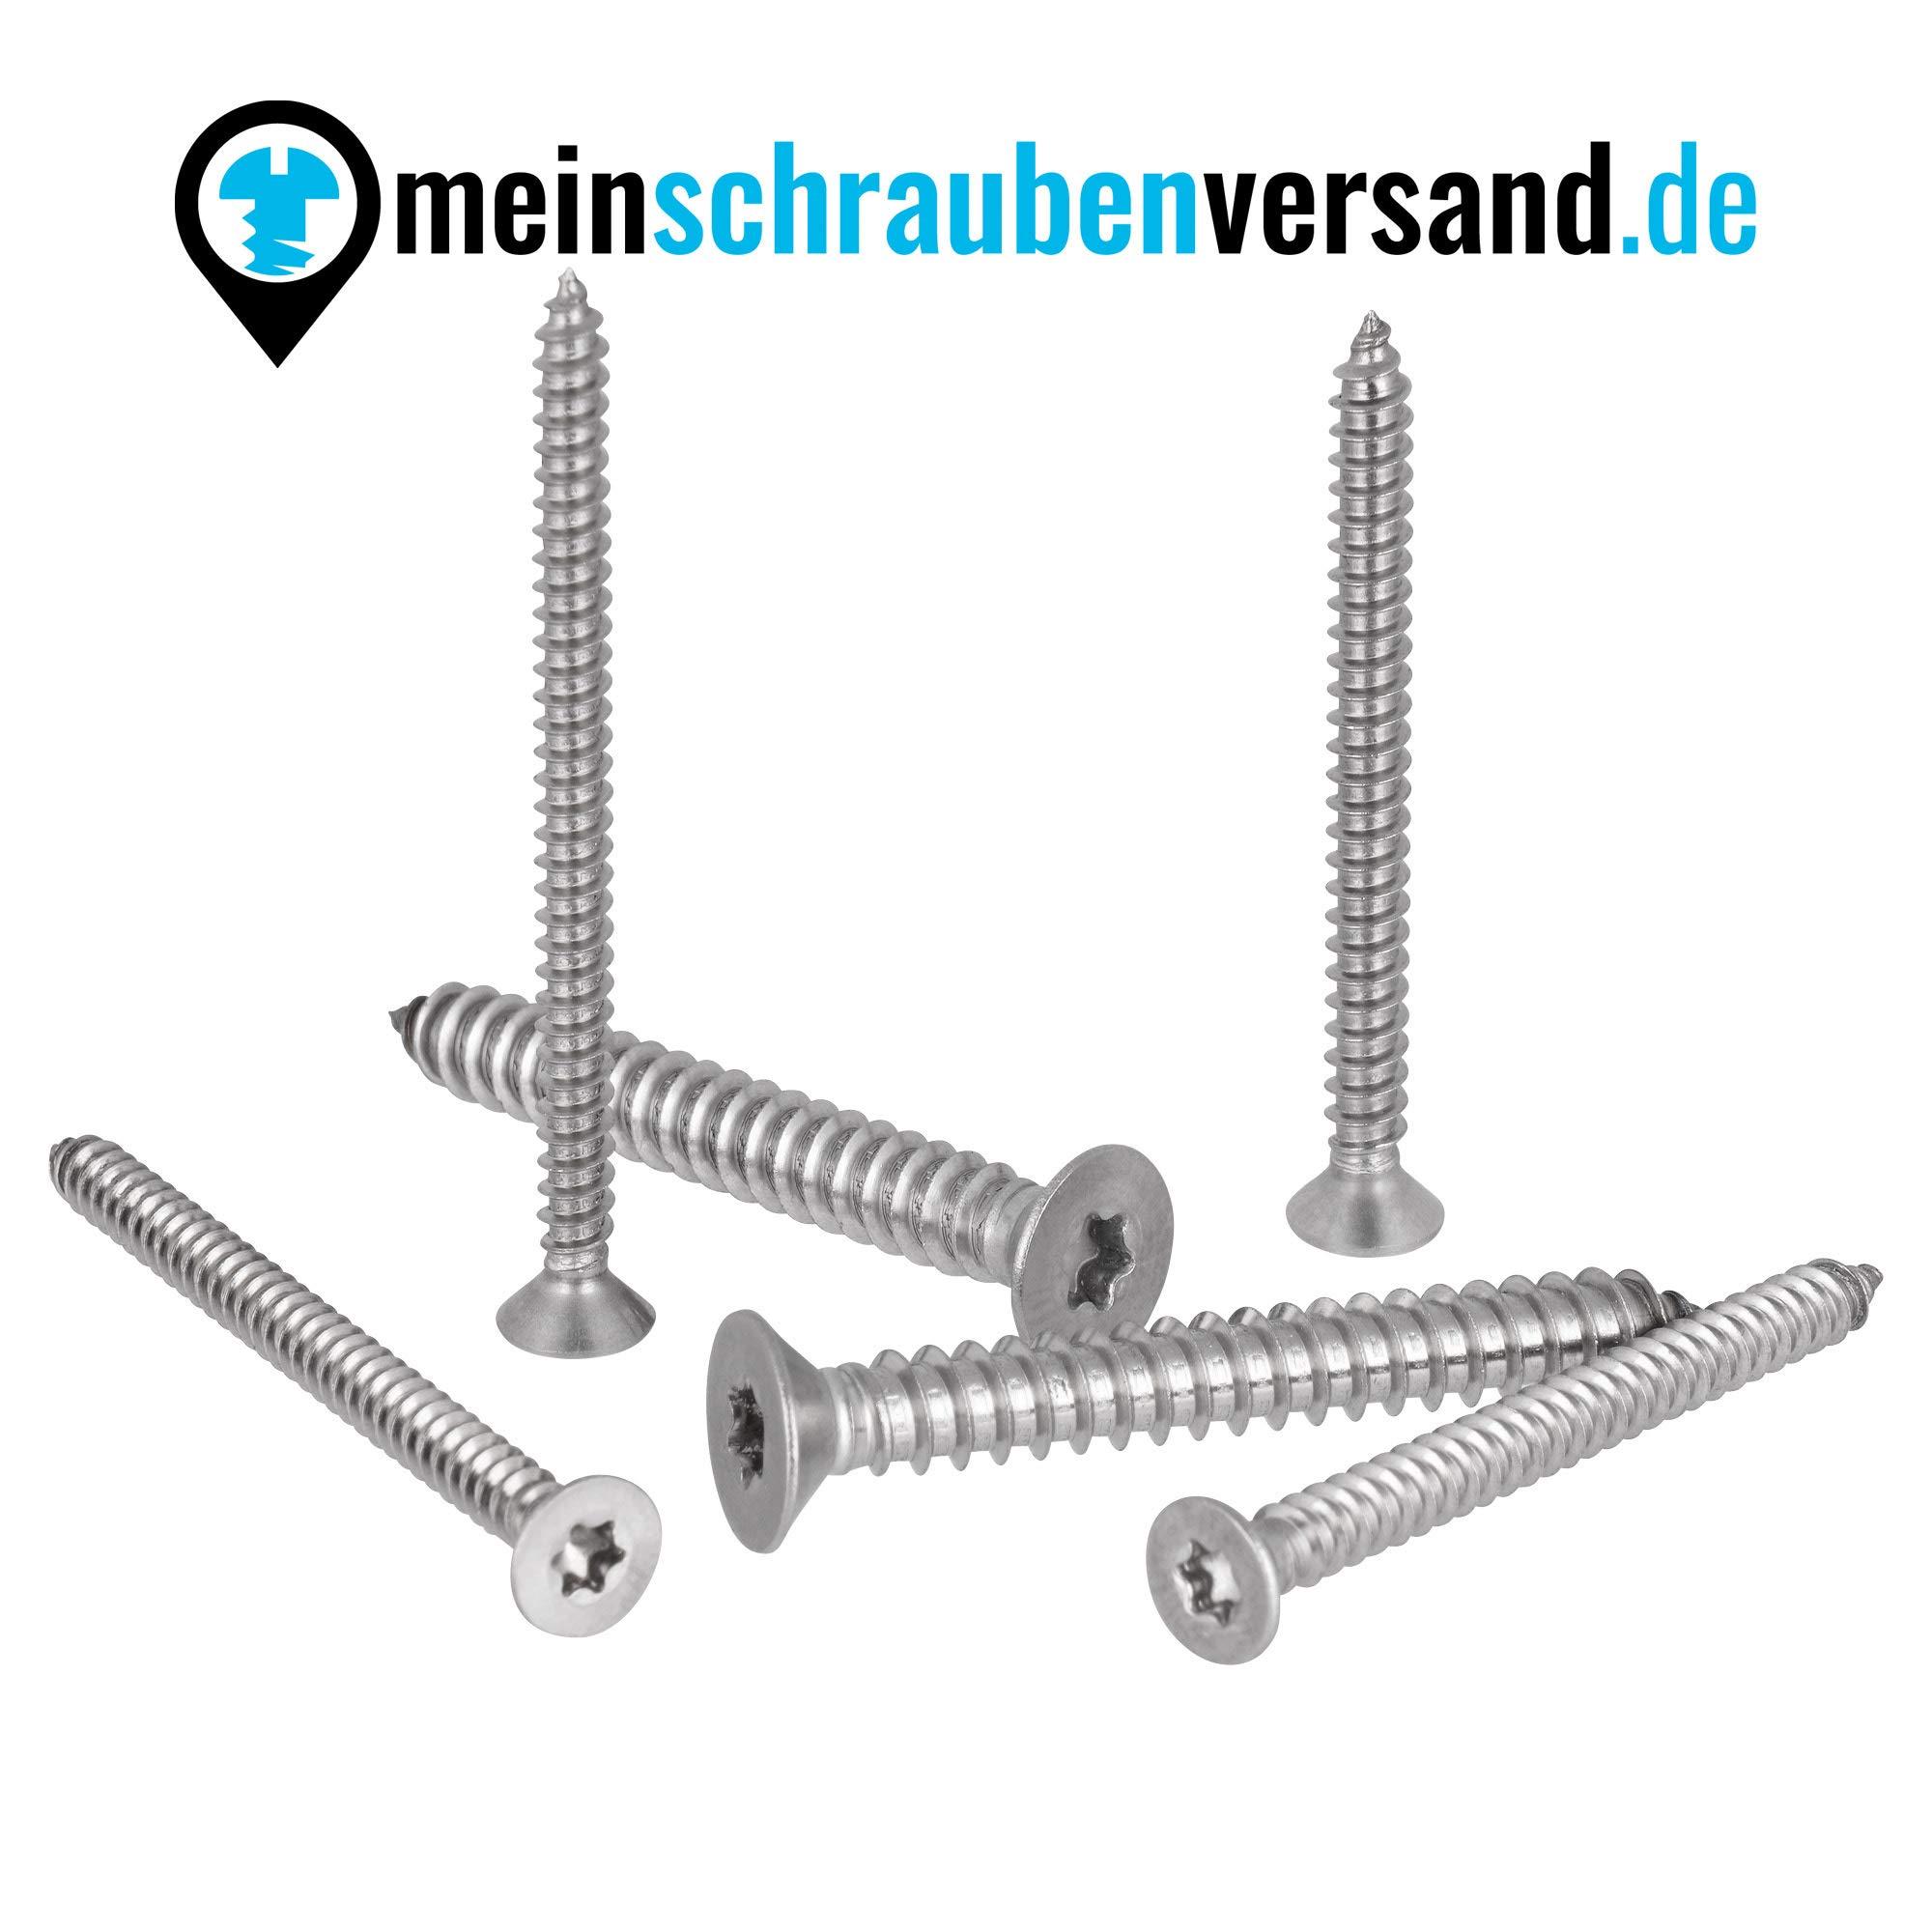 Blechschrauben Senkkopf 3,5x25 Torx Edelstahl ISO 14586 DIN 7982 Bohrspitze-selbstschneidend 3,5 x 25 mm 50 St/ück